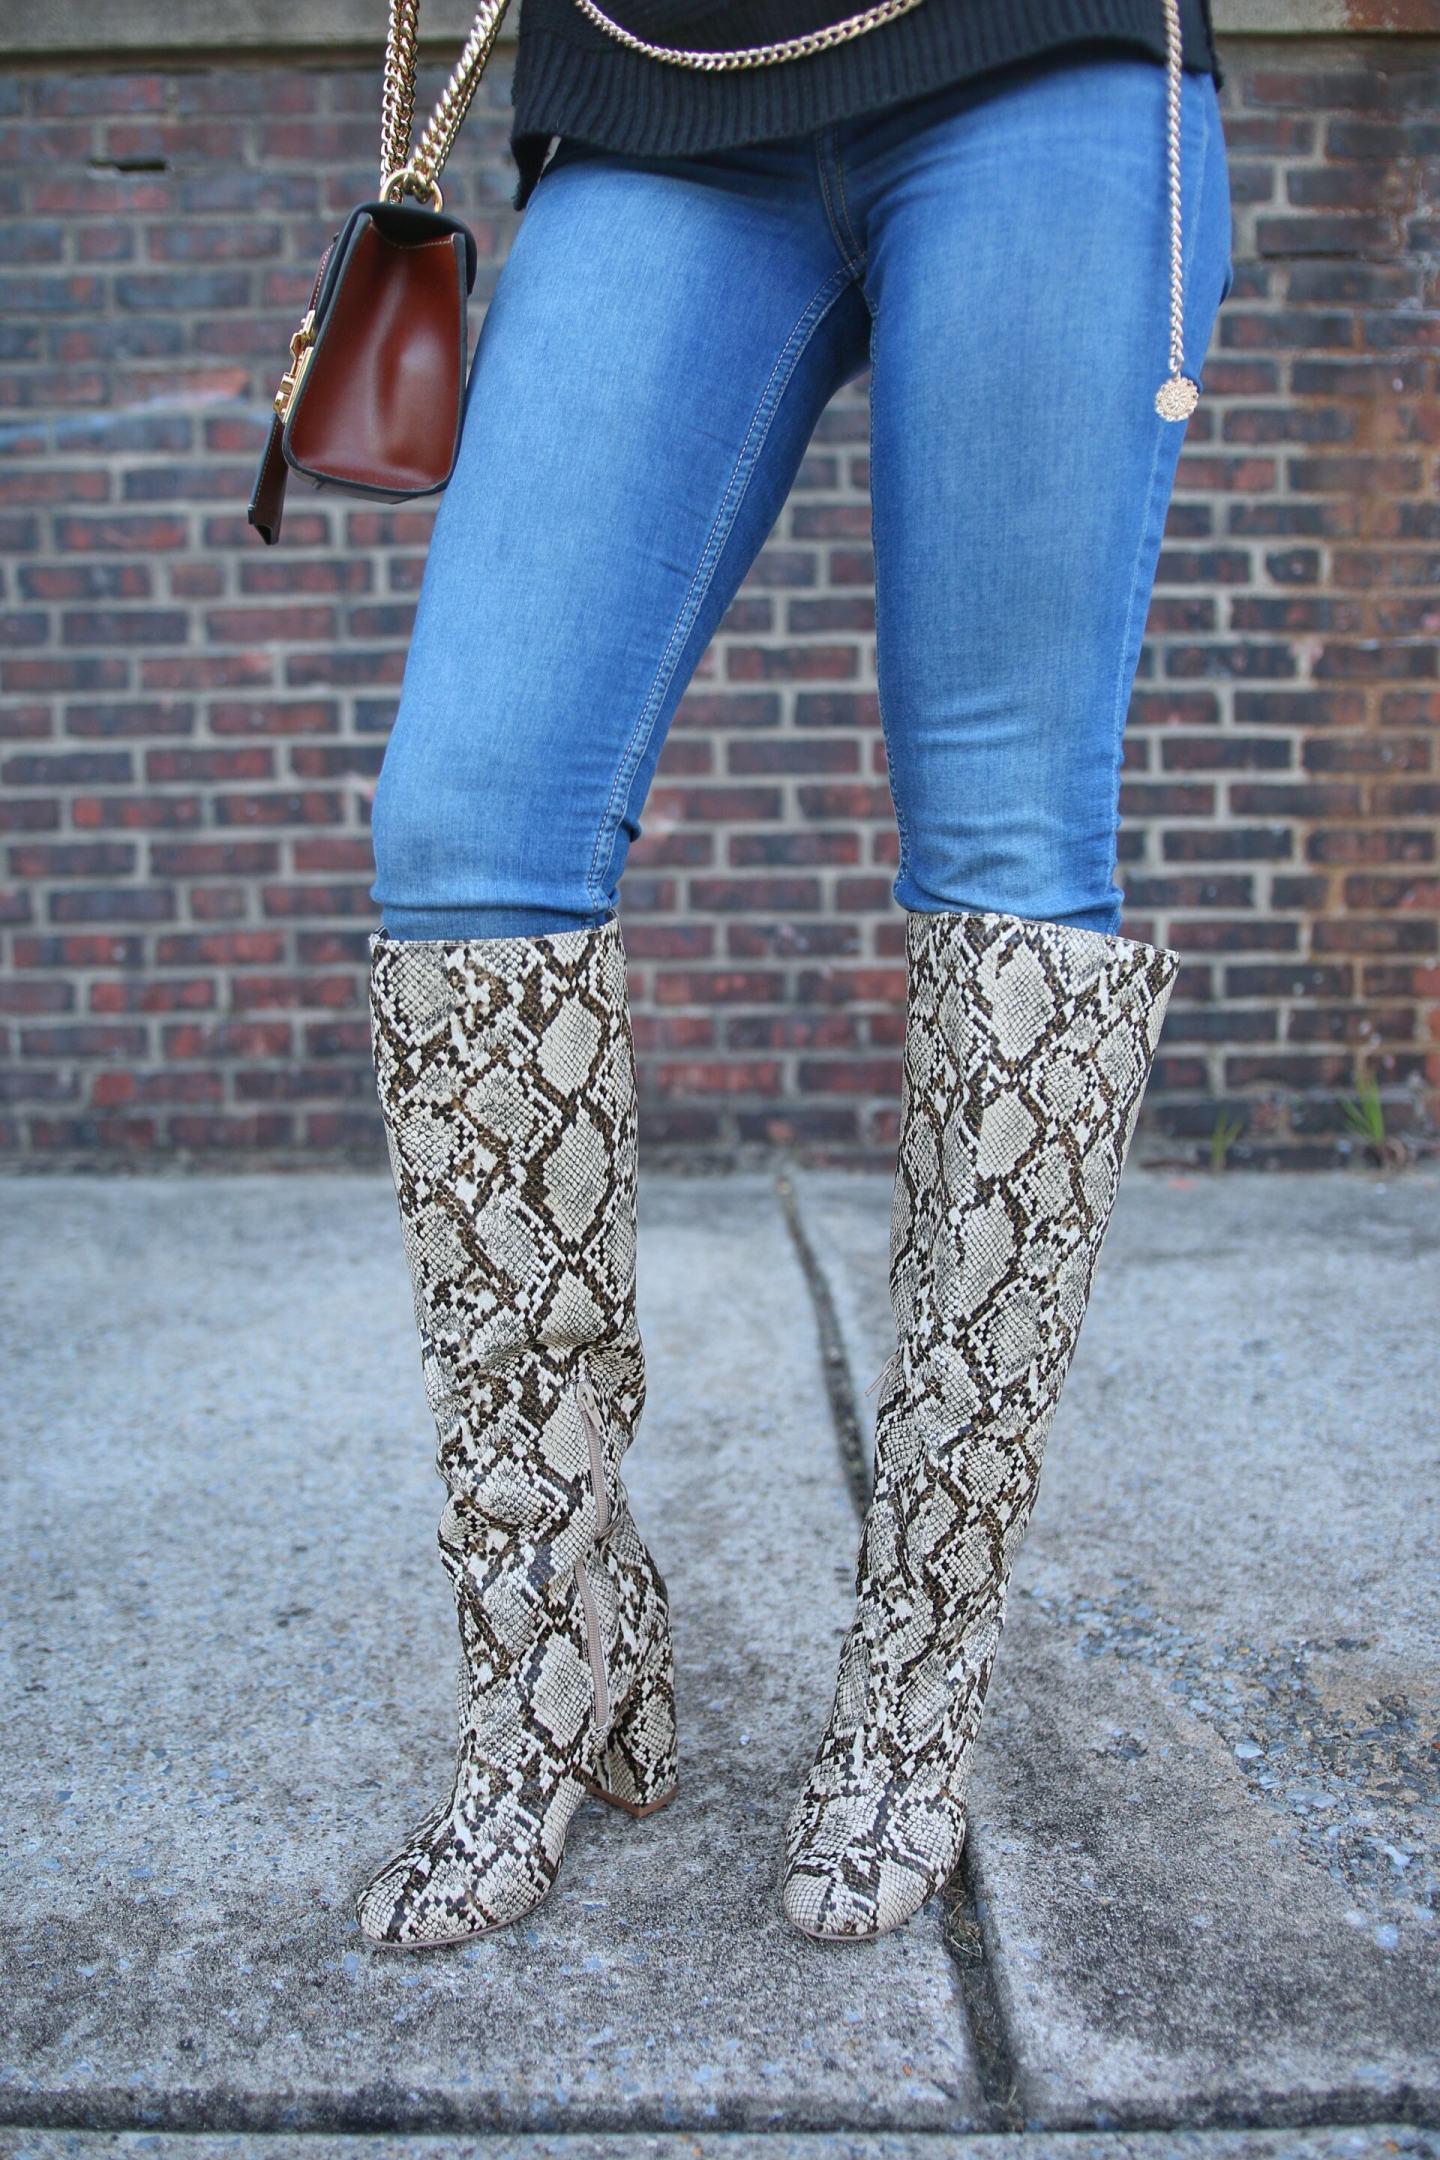 Snakeskin OTK Boots